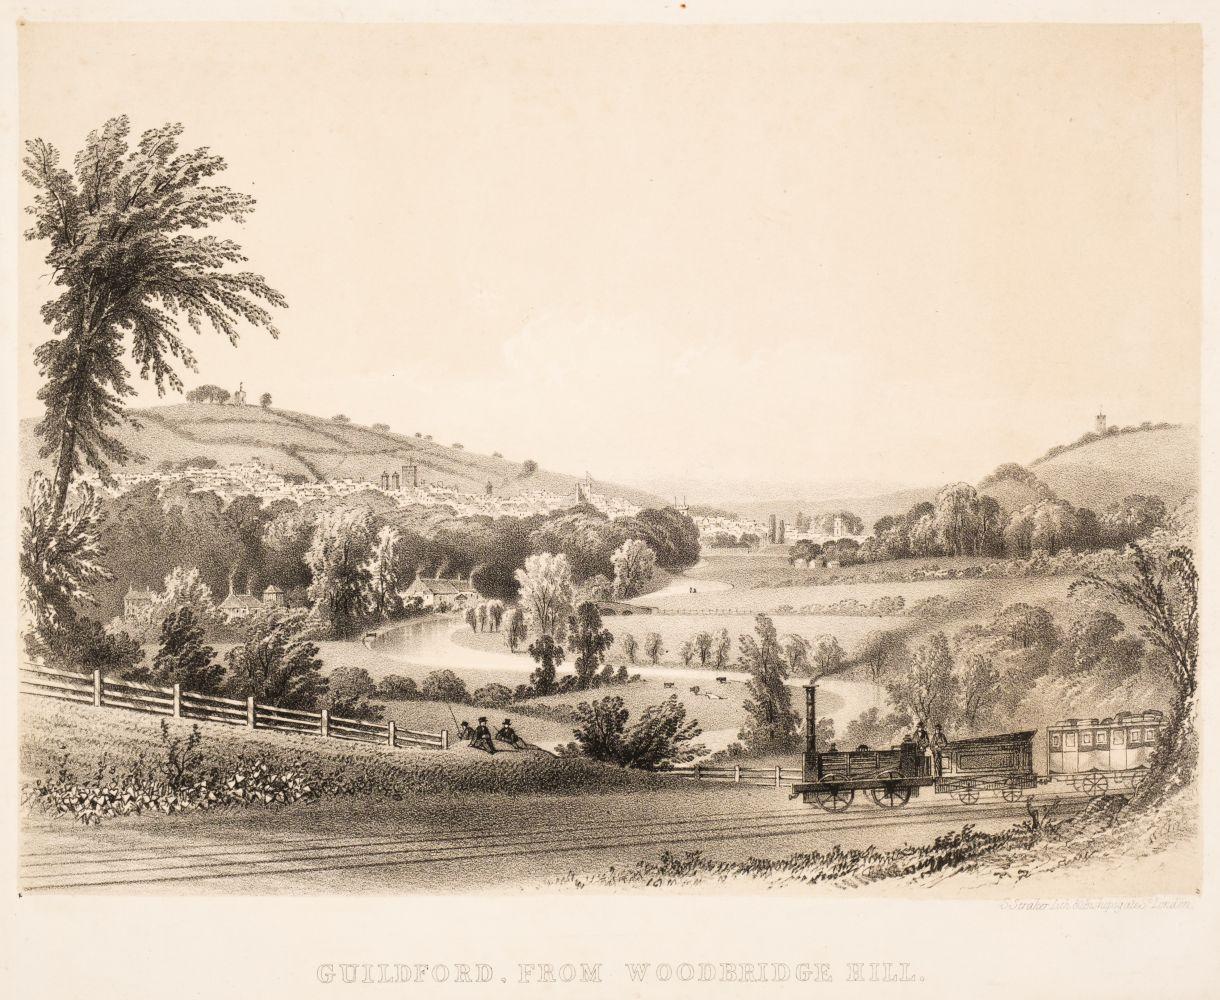 * Guildford. Straker (Samuel), Guildford from Woodbridge Hill, circa 1845